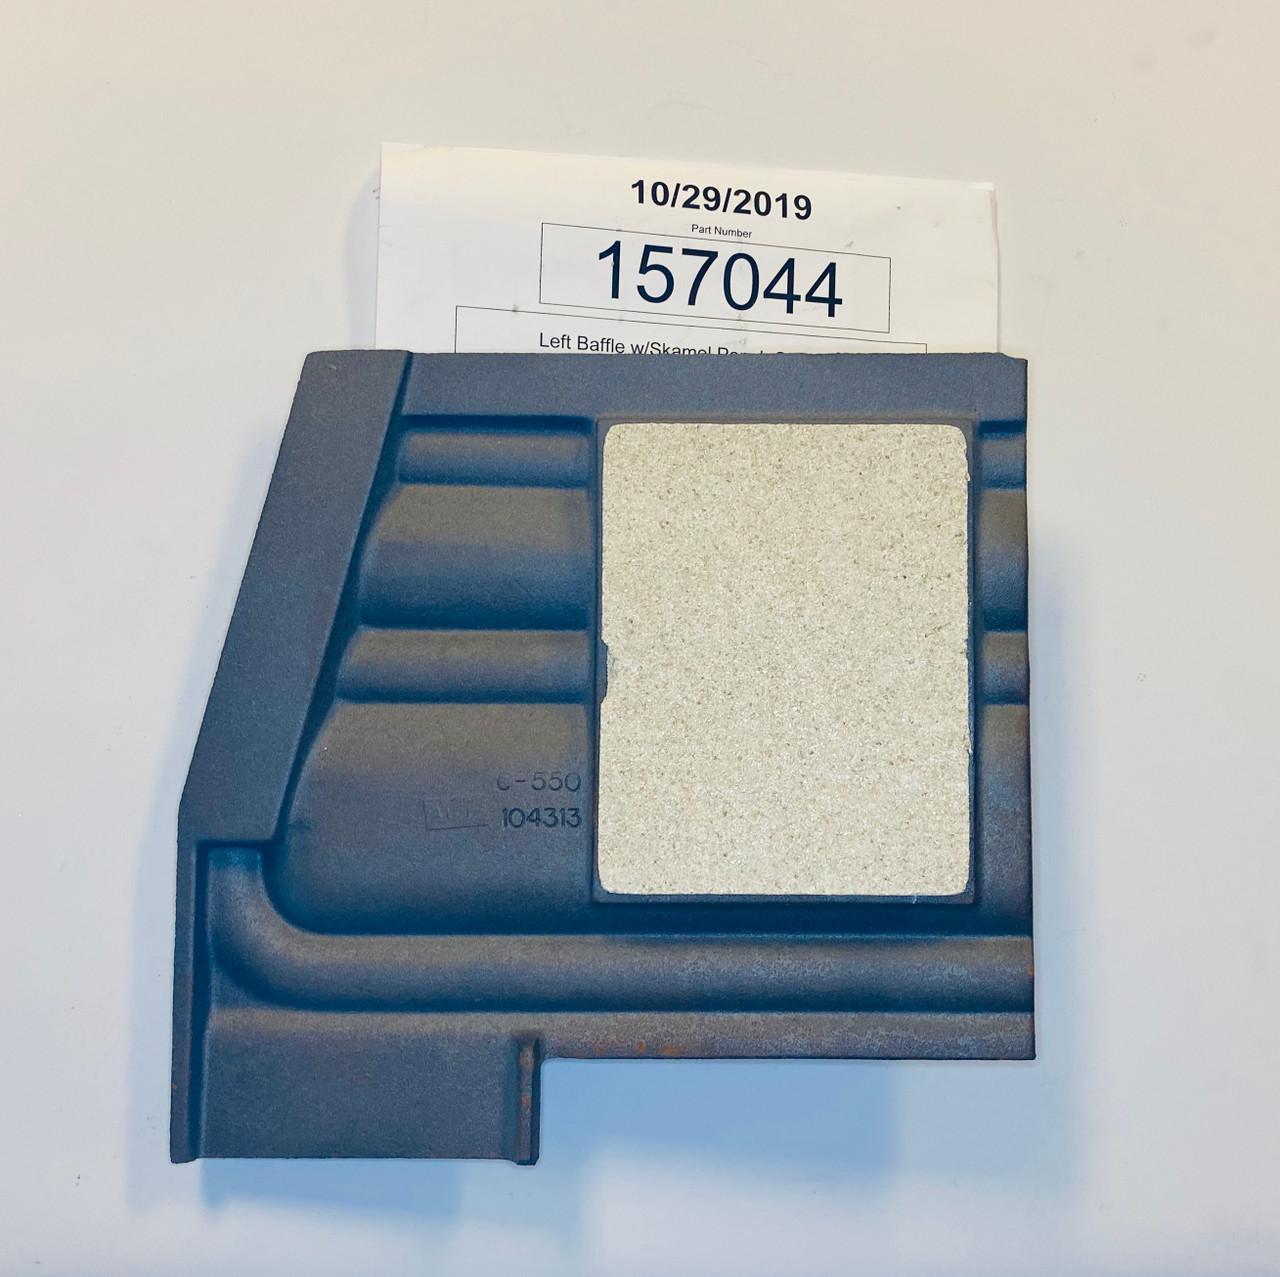 Jotul C550 LH Baffle Plate 157044  top side